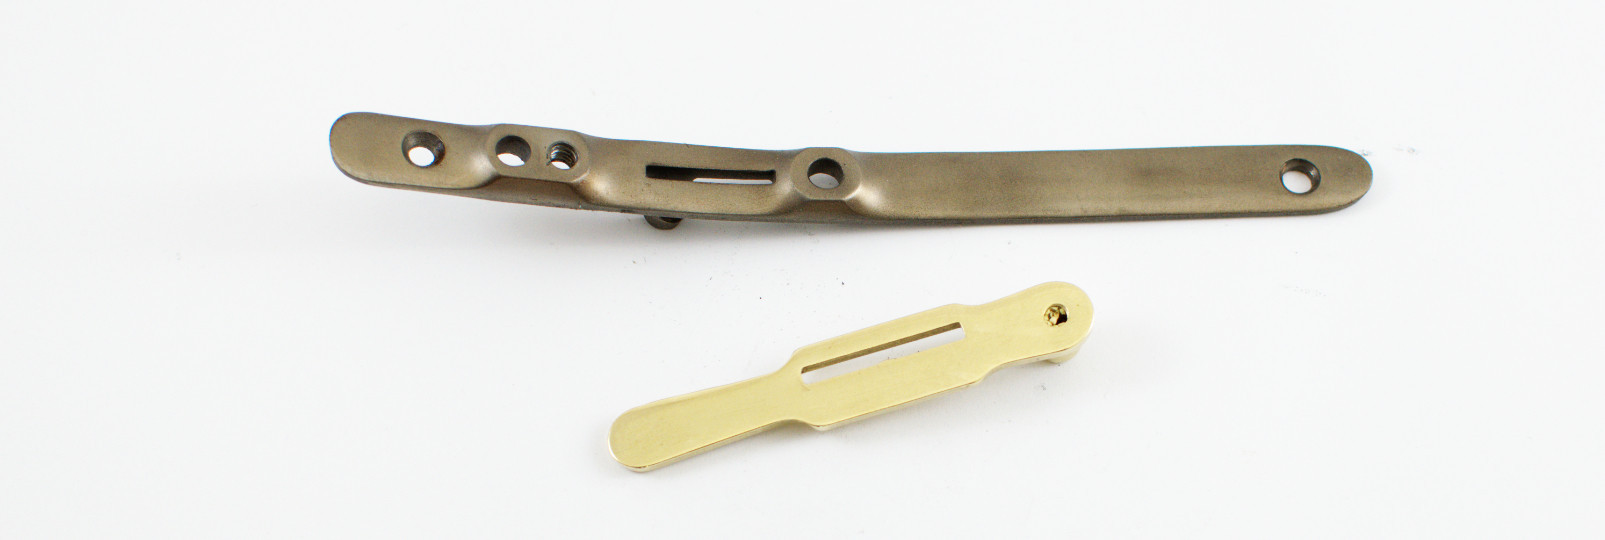 Trigger plate